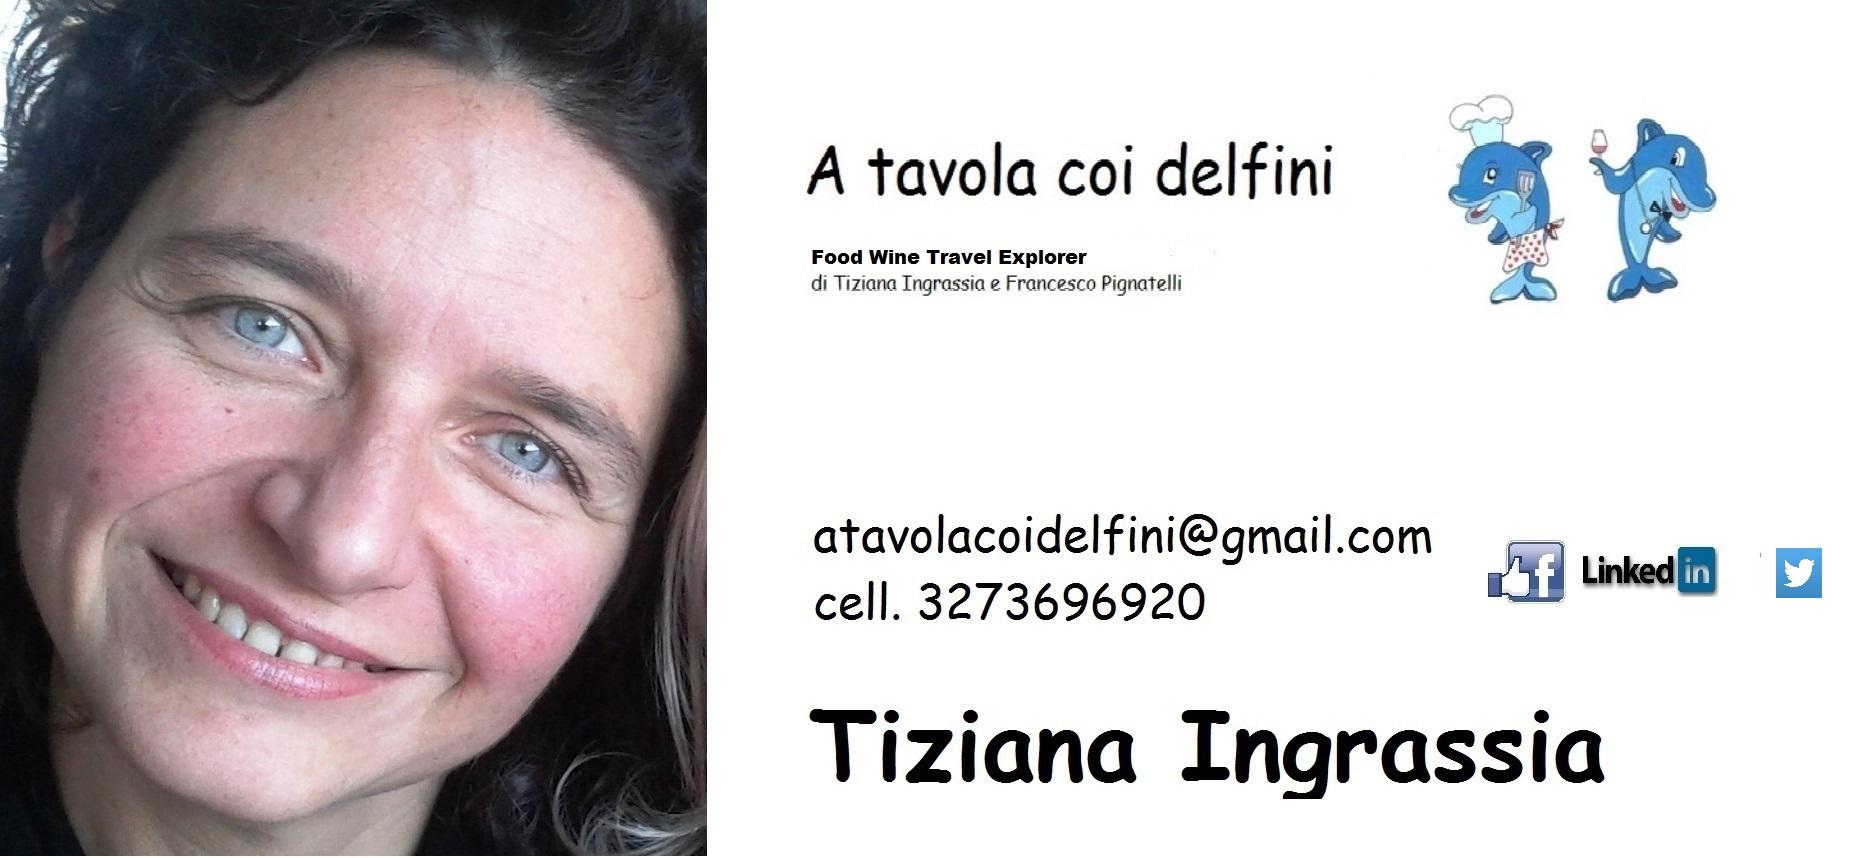 Tiziana Ingrassia